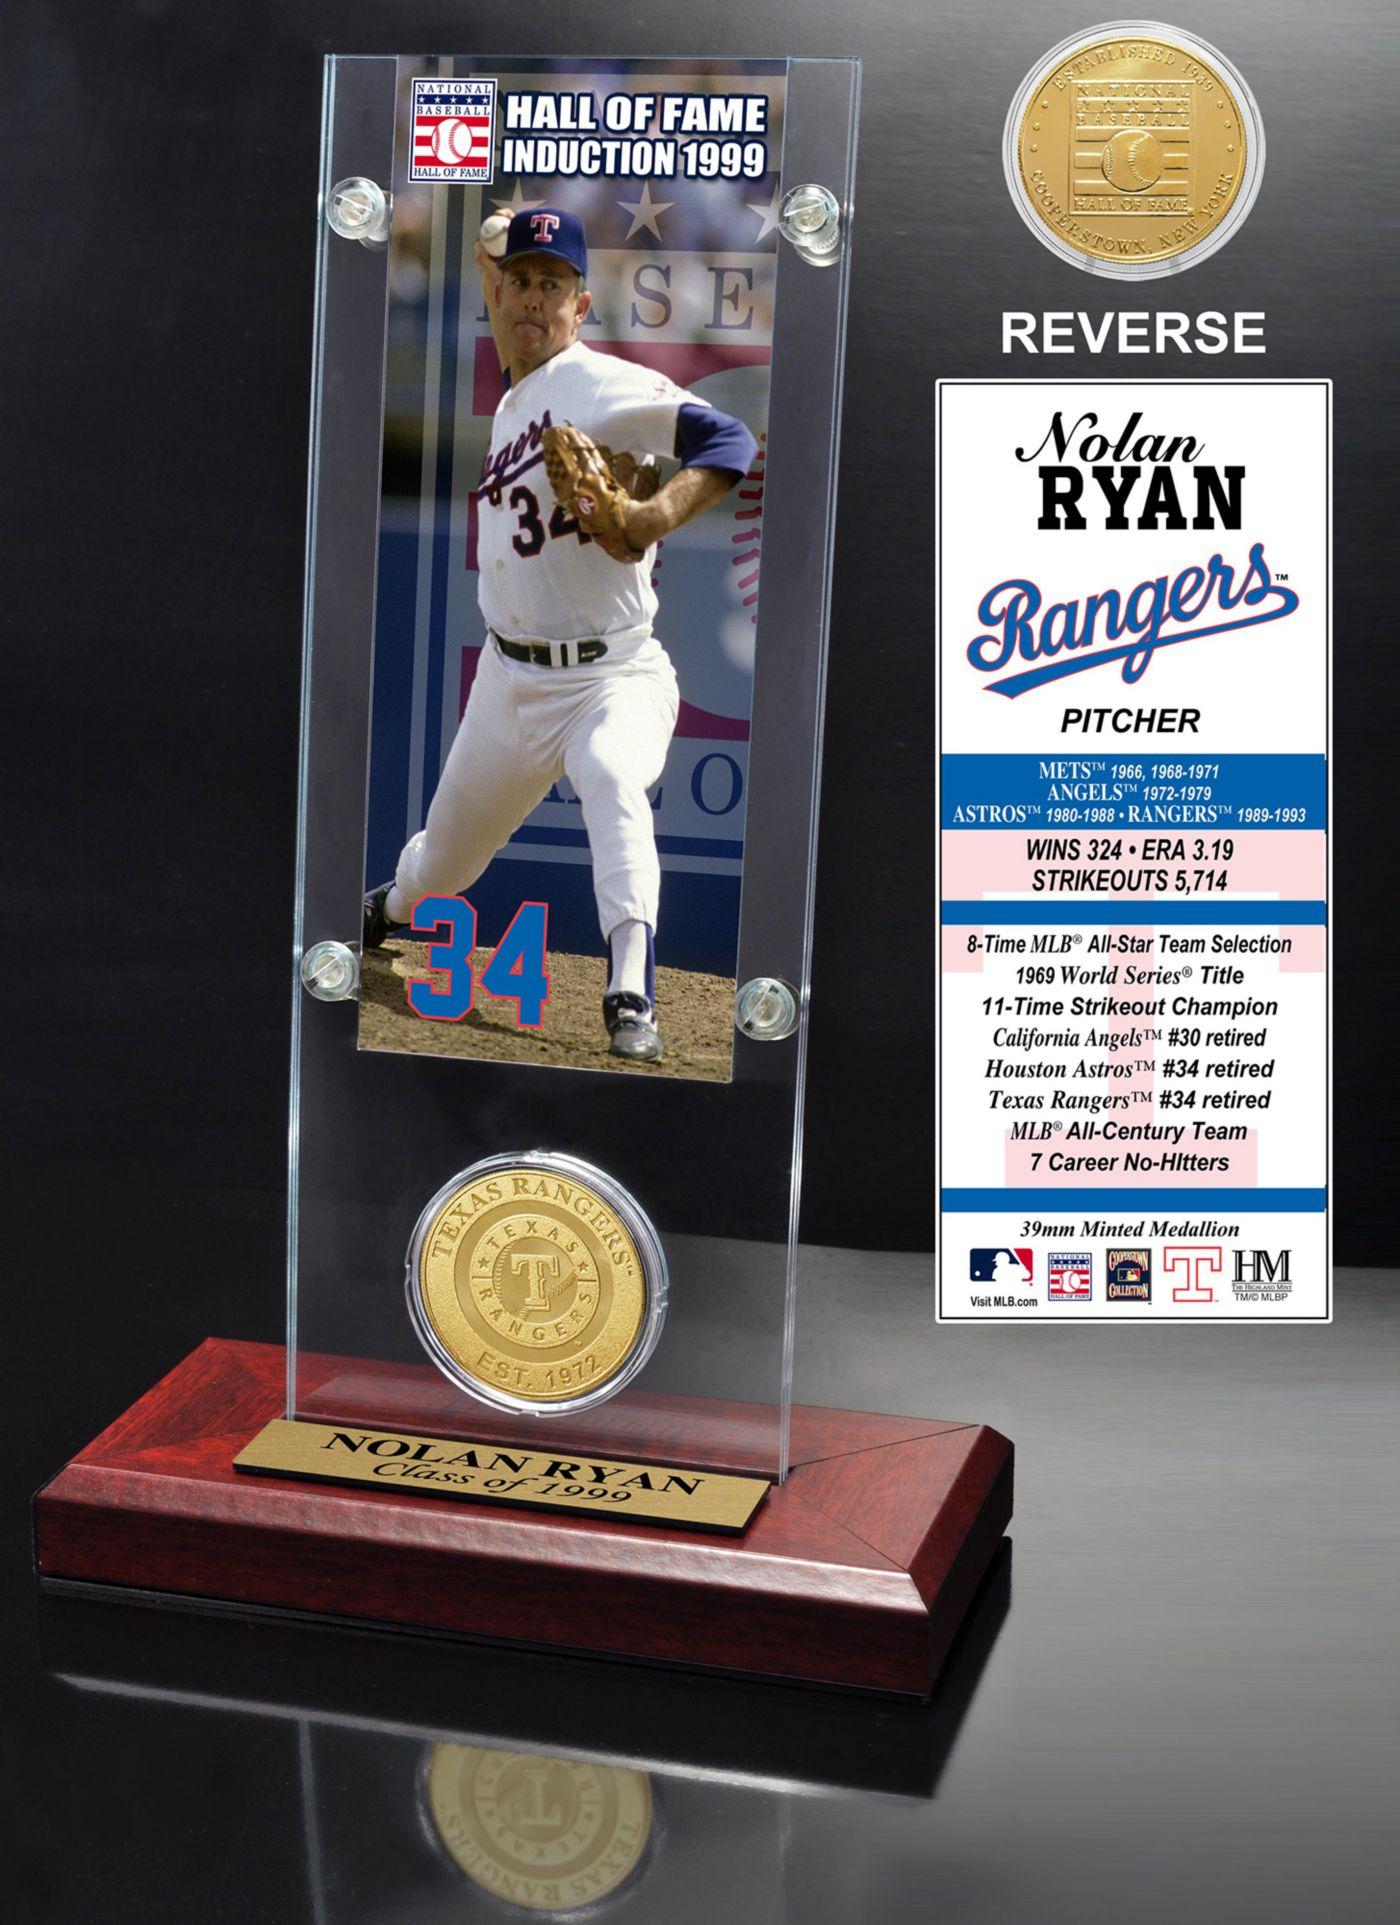 Highland Mint Nolan Ryan Texas Rangers Hall of Fame Ticket and Bronze Coin Acrylic Desktop Display